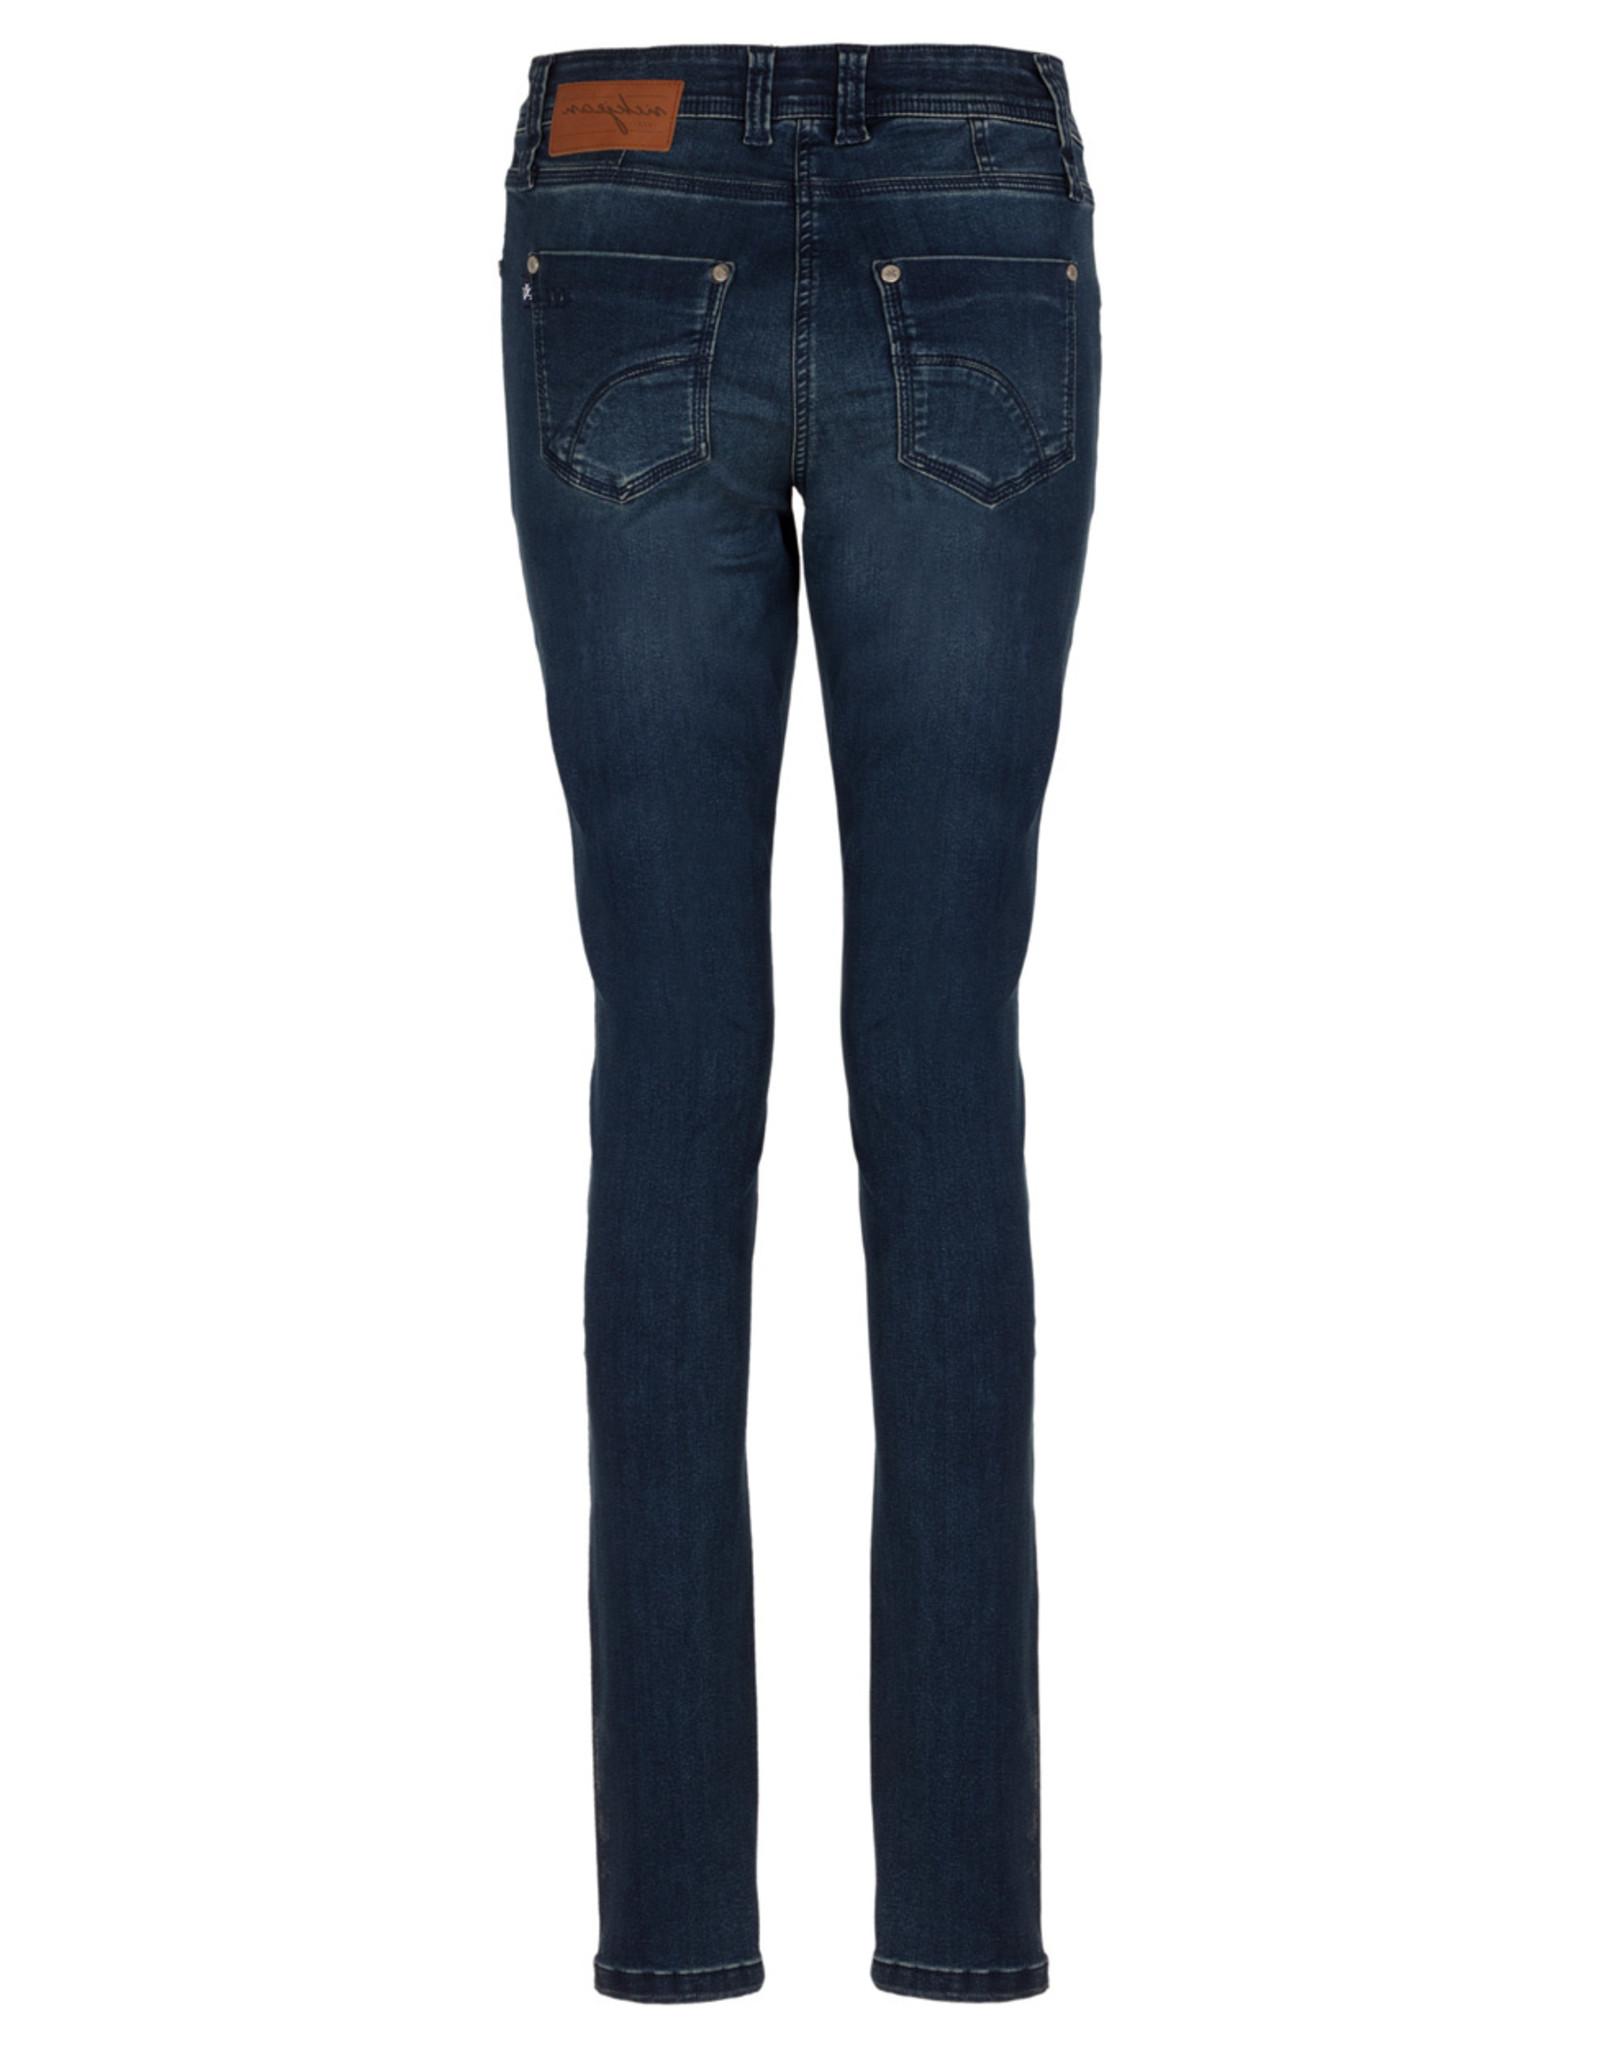 Nickjean Broek Bess Jeans